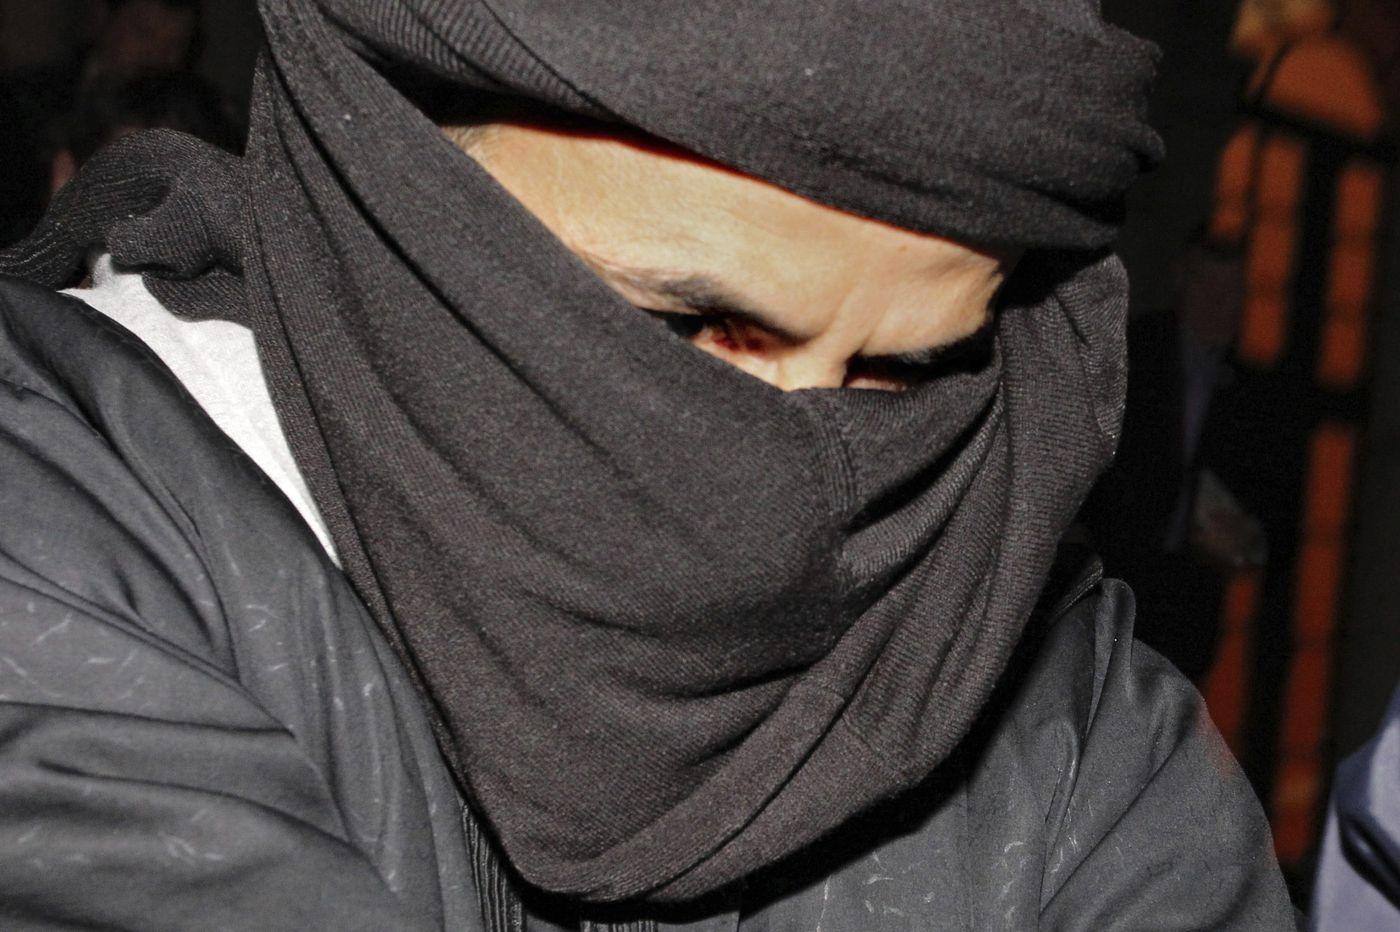 'Jihad Jane' terrorist known as 'theblackflag' gets 15-year sentence